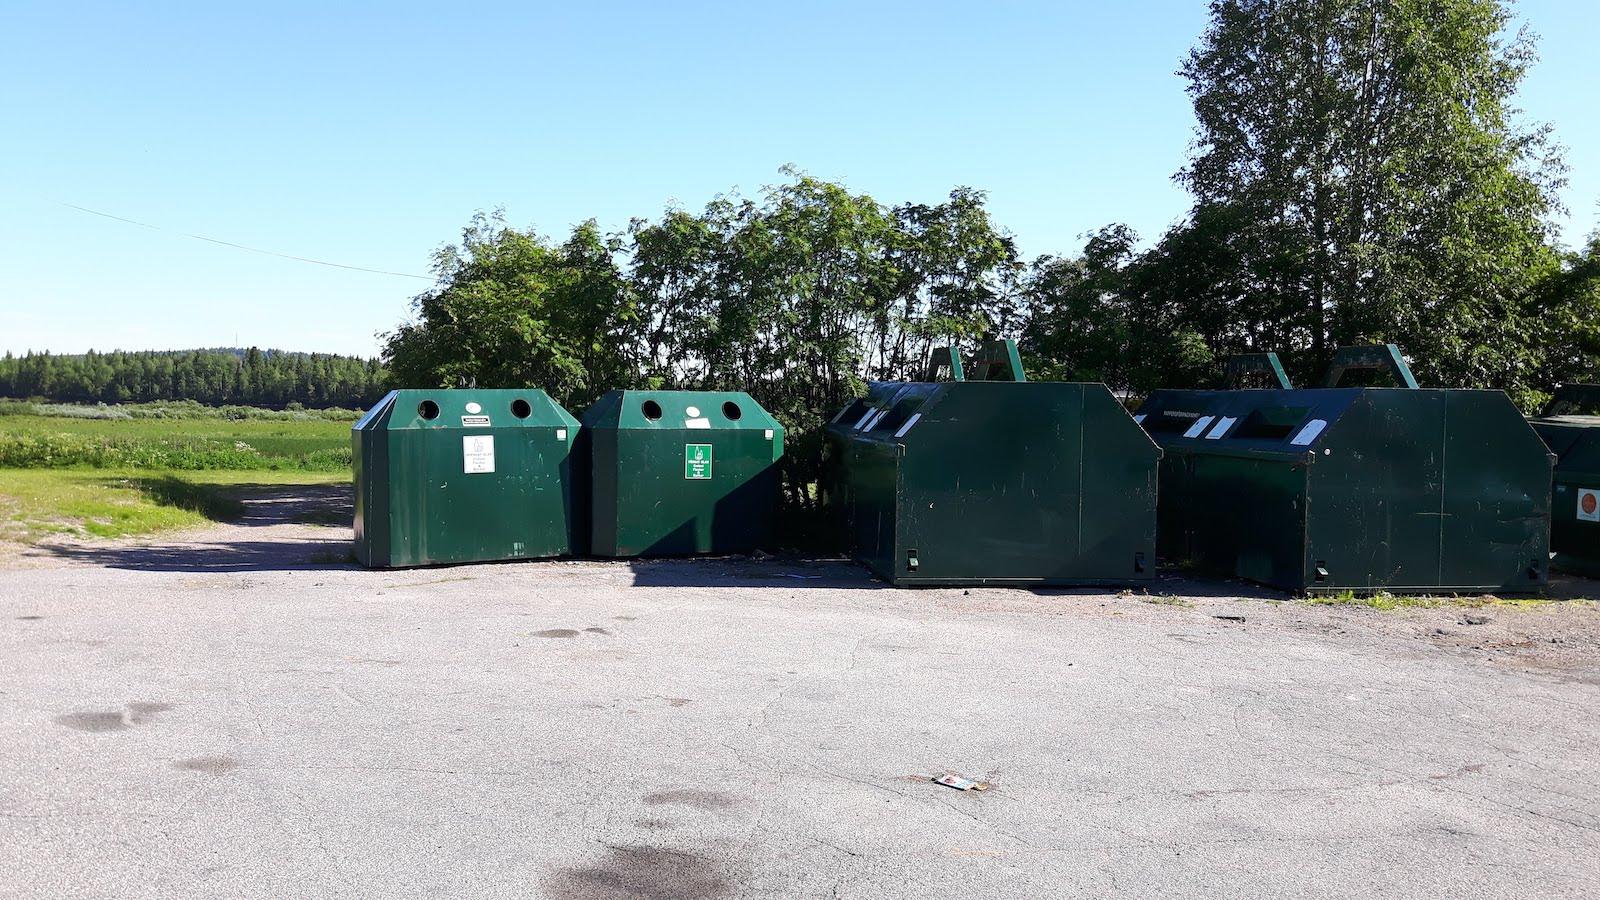 Recycling Junosuando Sweden